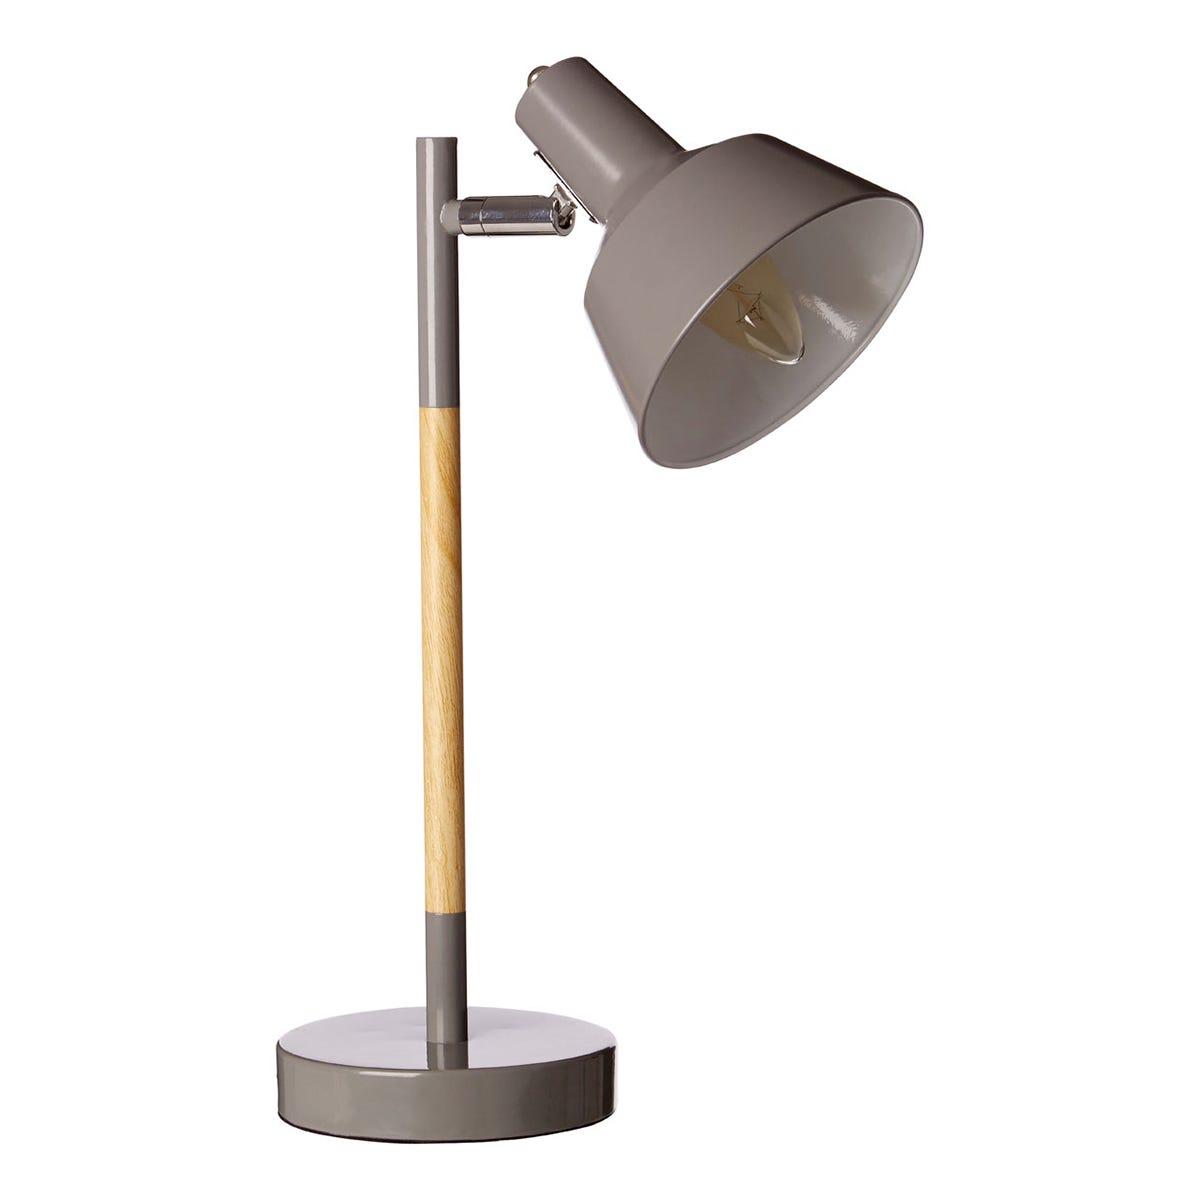 Premier Housewares Bryson Wood Table Lamp - Grey